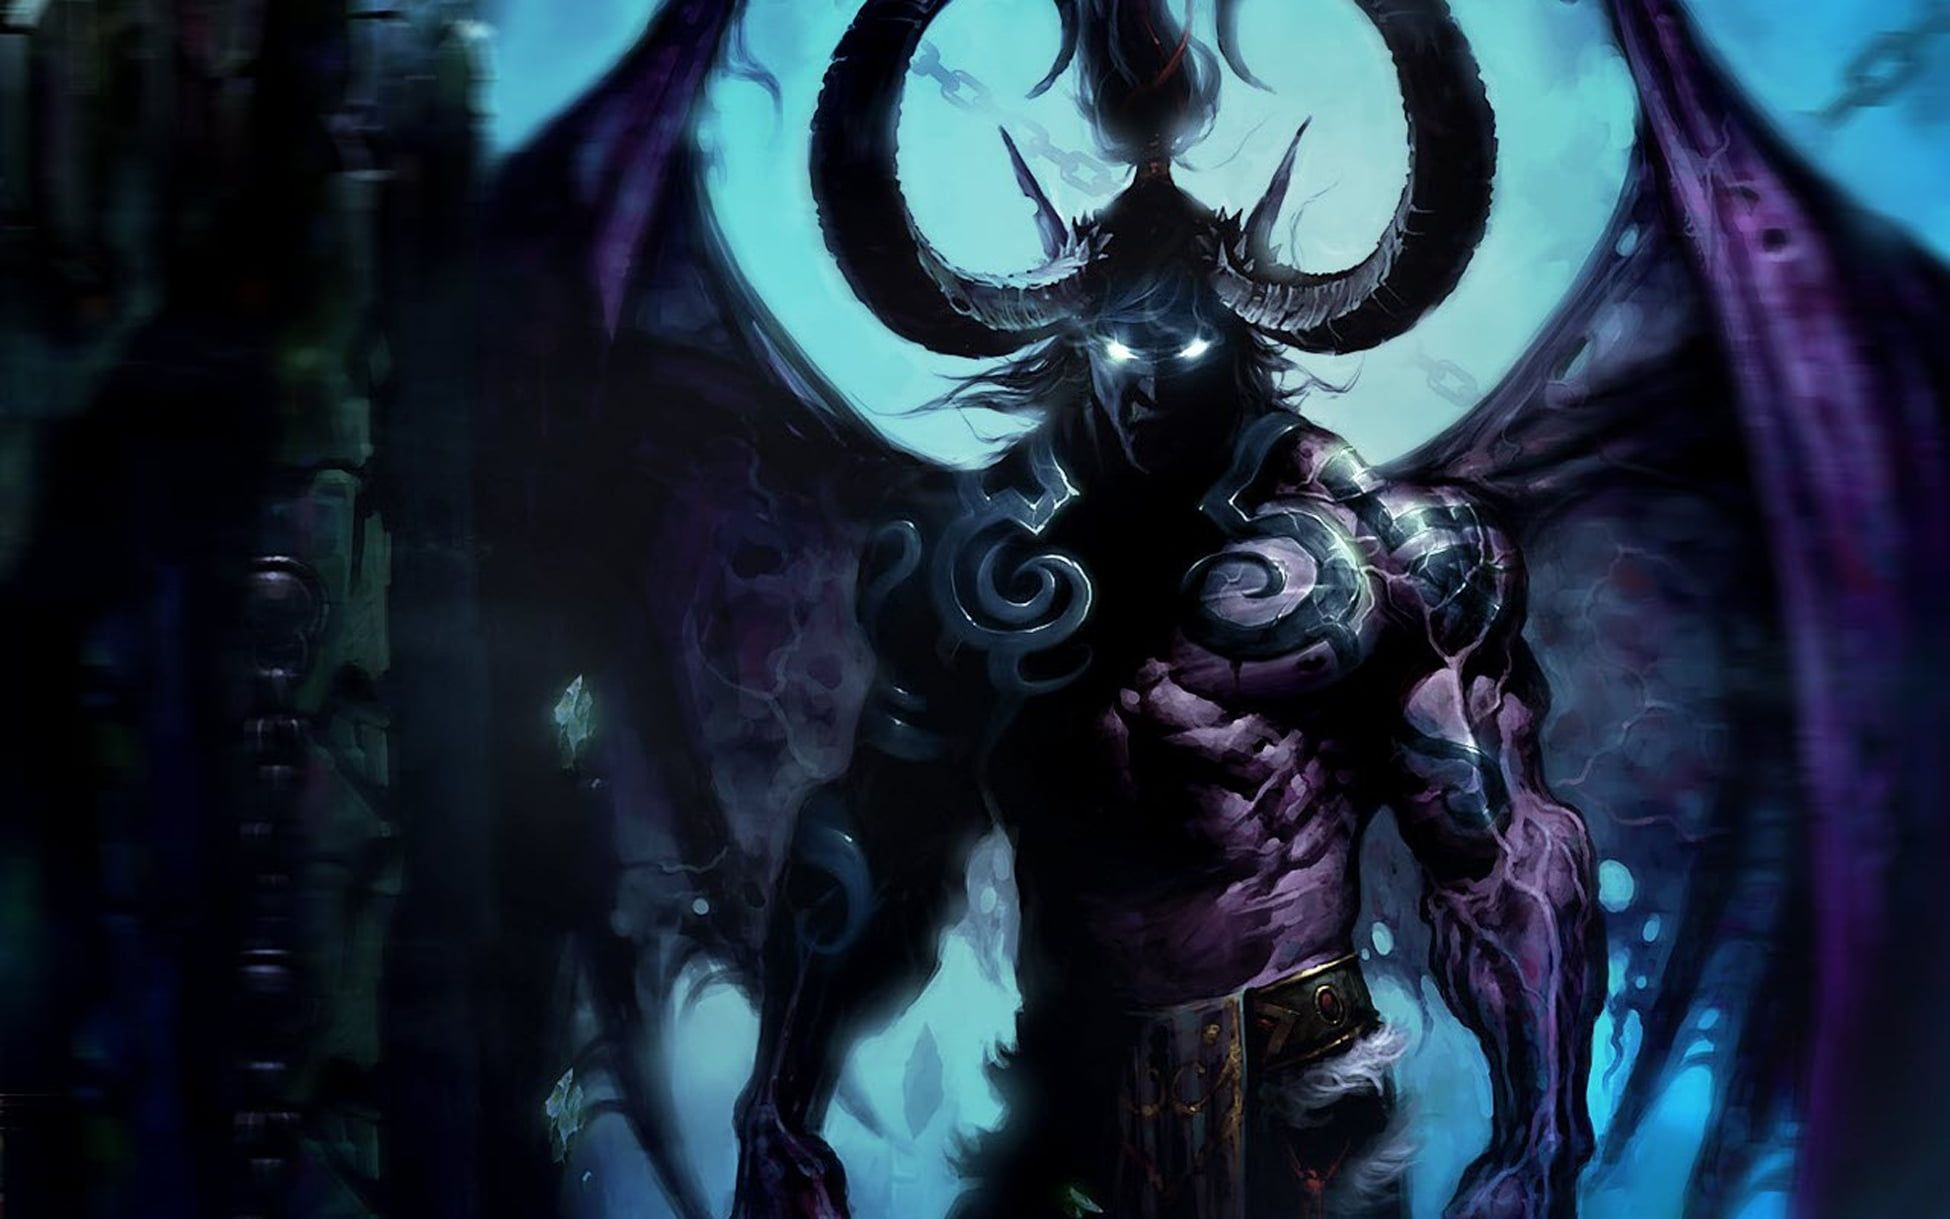 Terrorblade Clip Art The Demon Wow World Of Warcraft Illidan Illidan 1080p Wallpaper Hdw In 2021 Anime Wallpaper Download Anime Wallpaper Android Wallpaper Anime